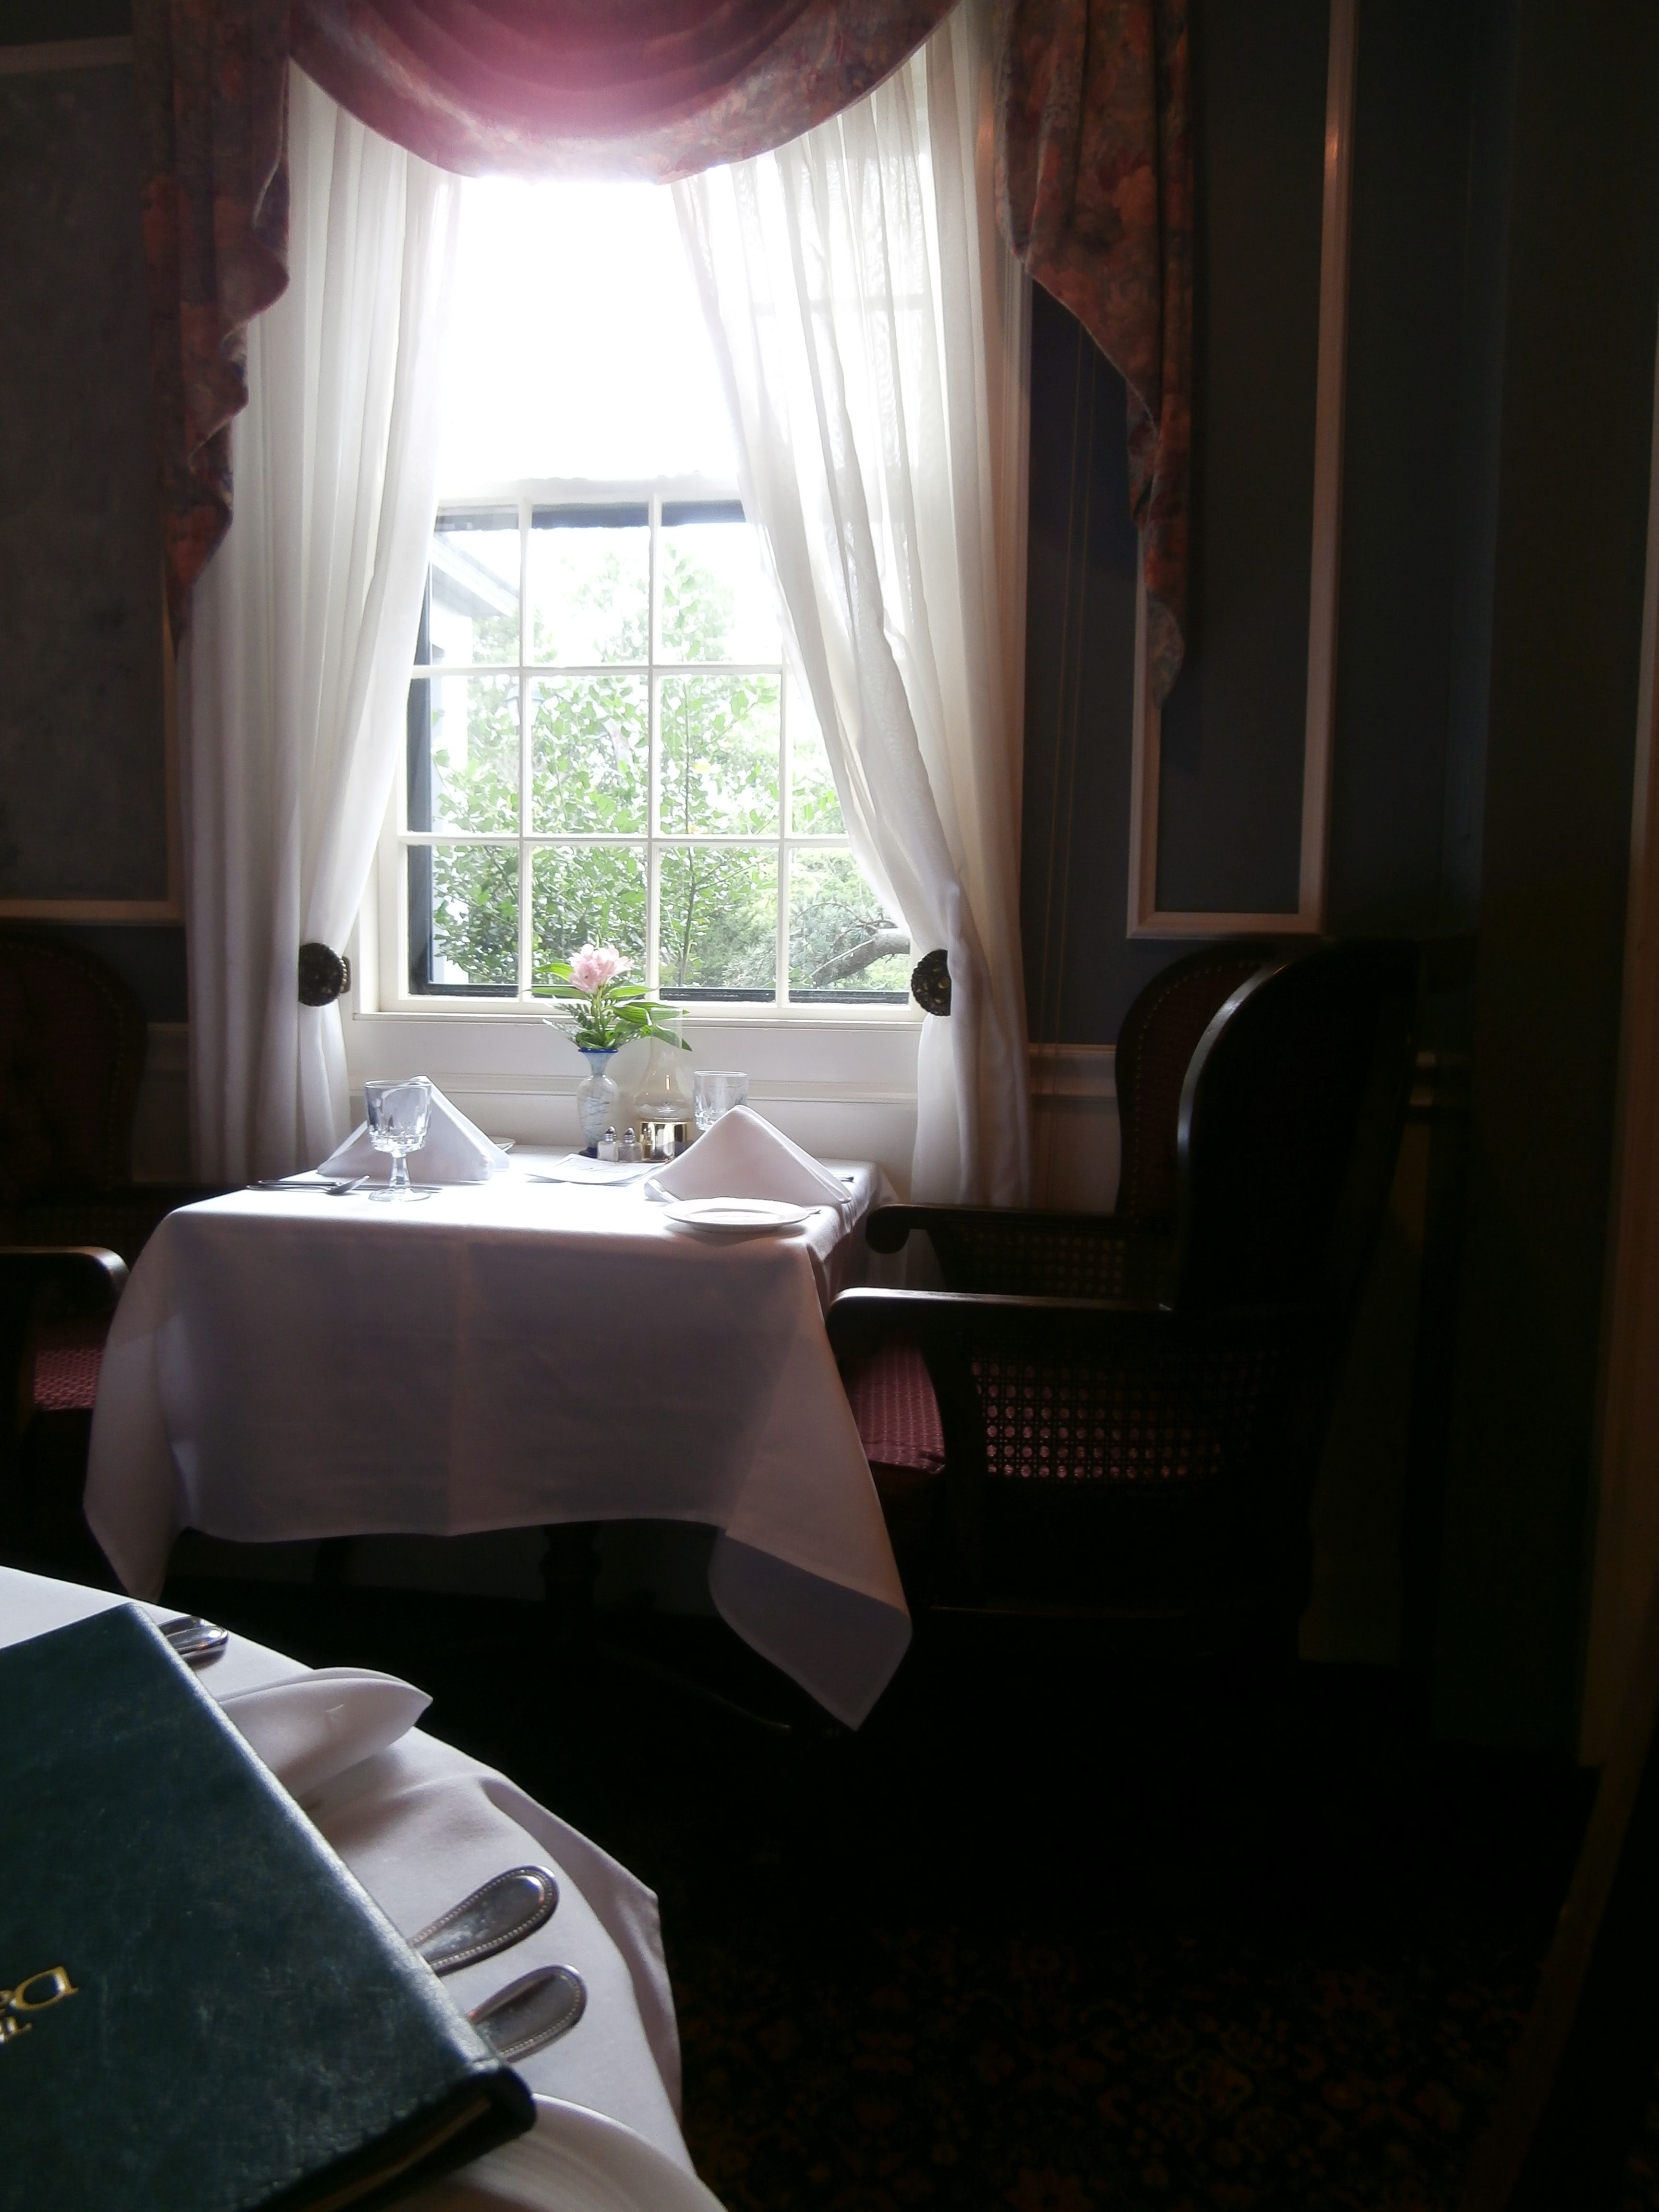 Daniel Webster Hotel & Restaurant, Cape Cod,  Massachusetts